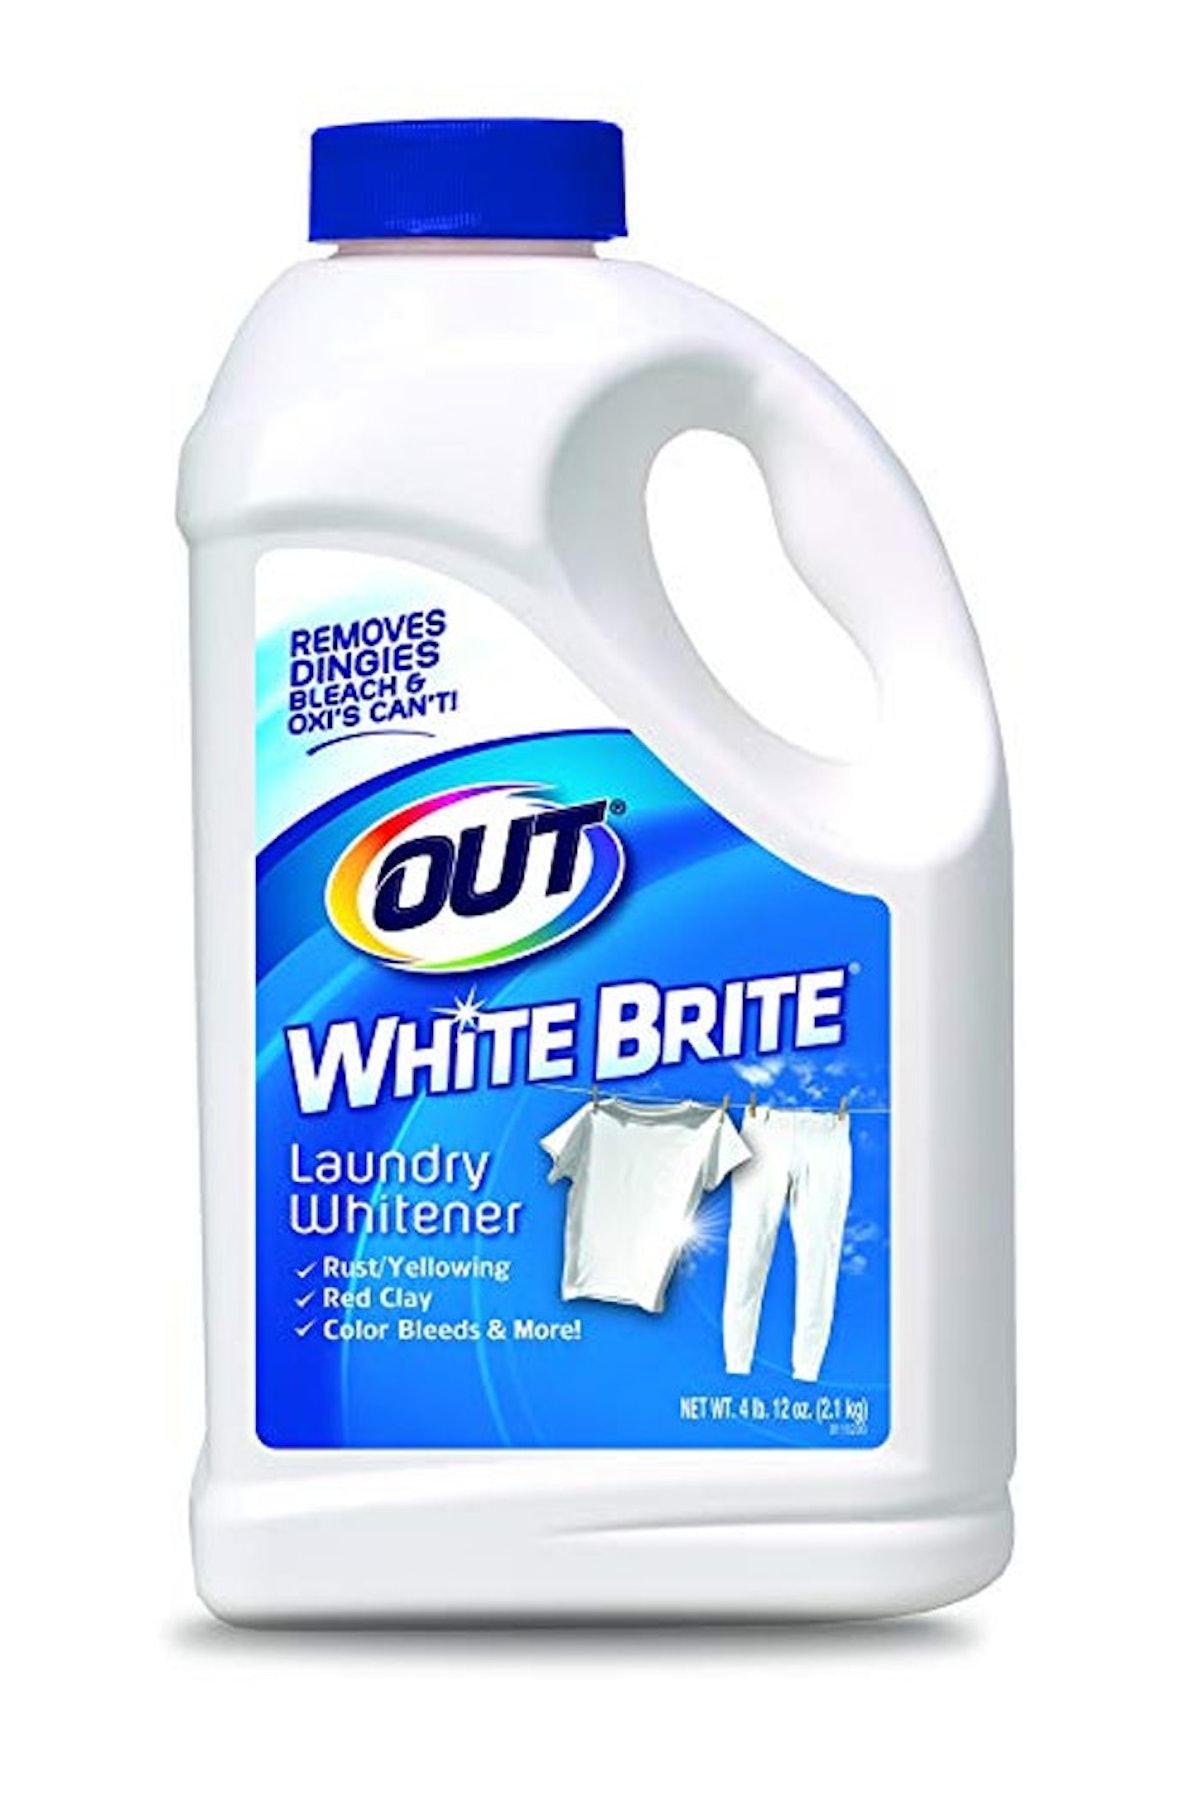 OUT White Brite Laundry Whitener